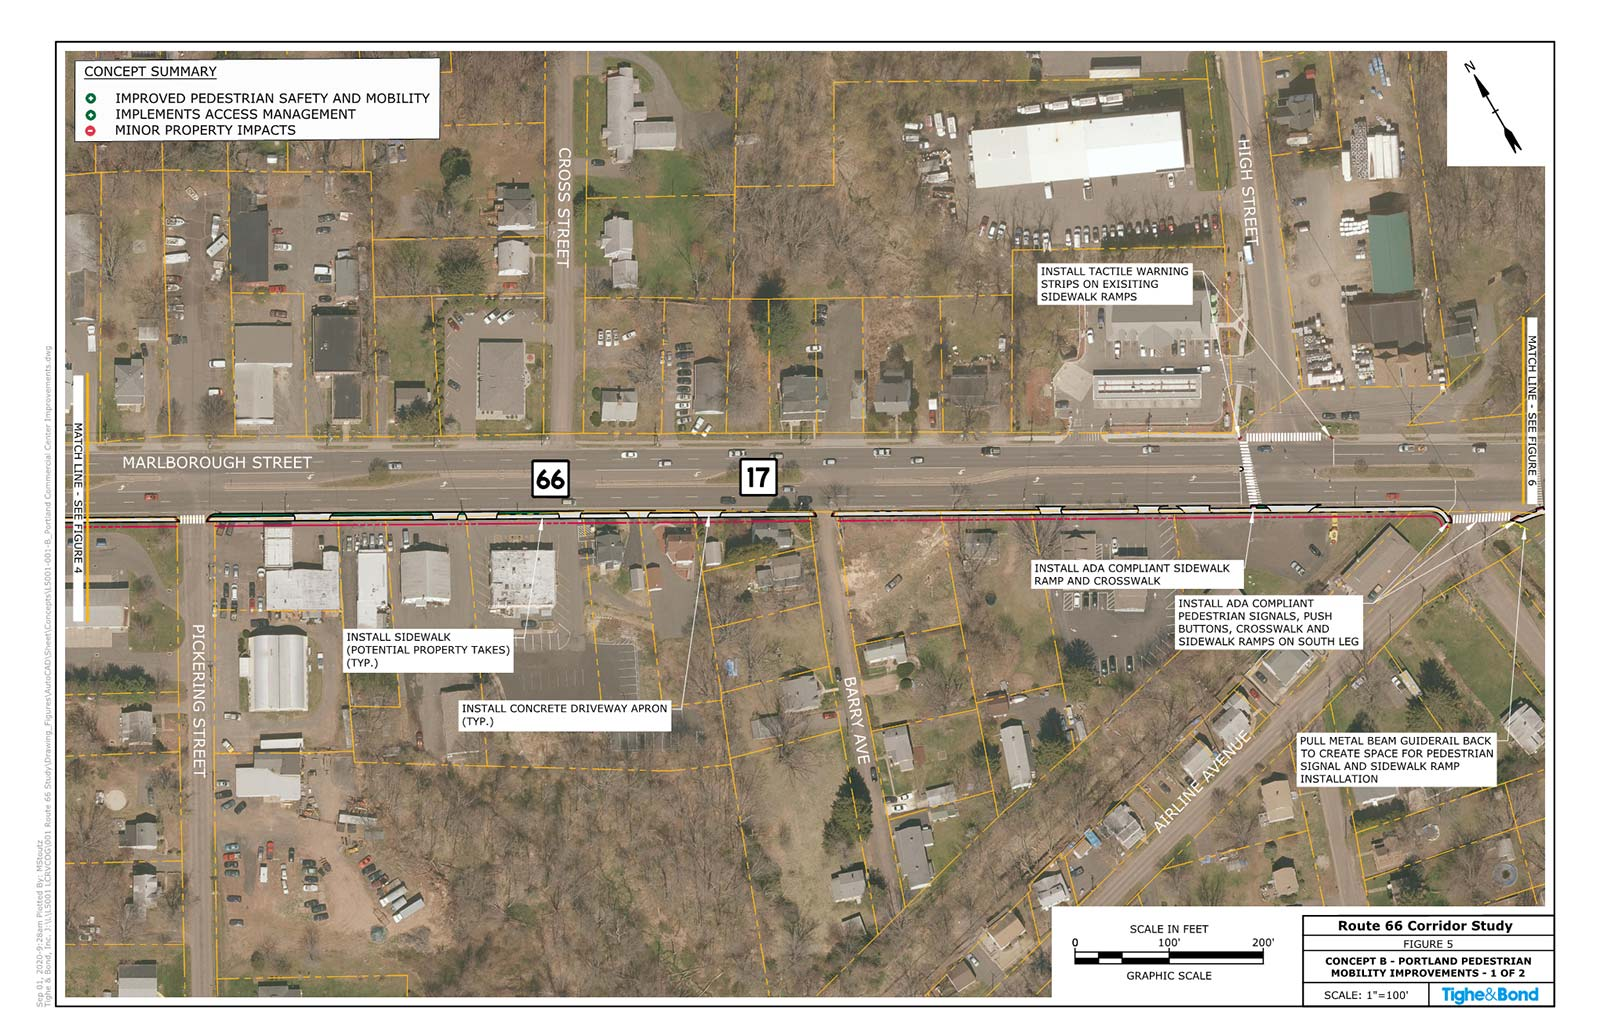 Route 66 Pedestrian Mobility Improvements (Concept B). Route 66 Transportation Study, Portland and East Hampton, CT.